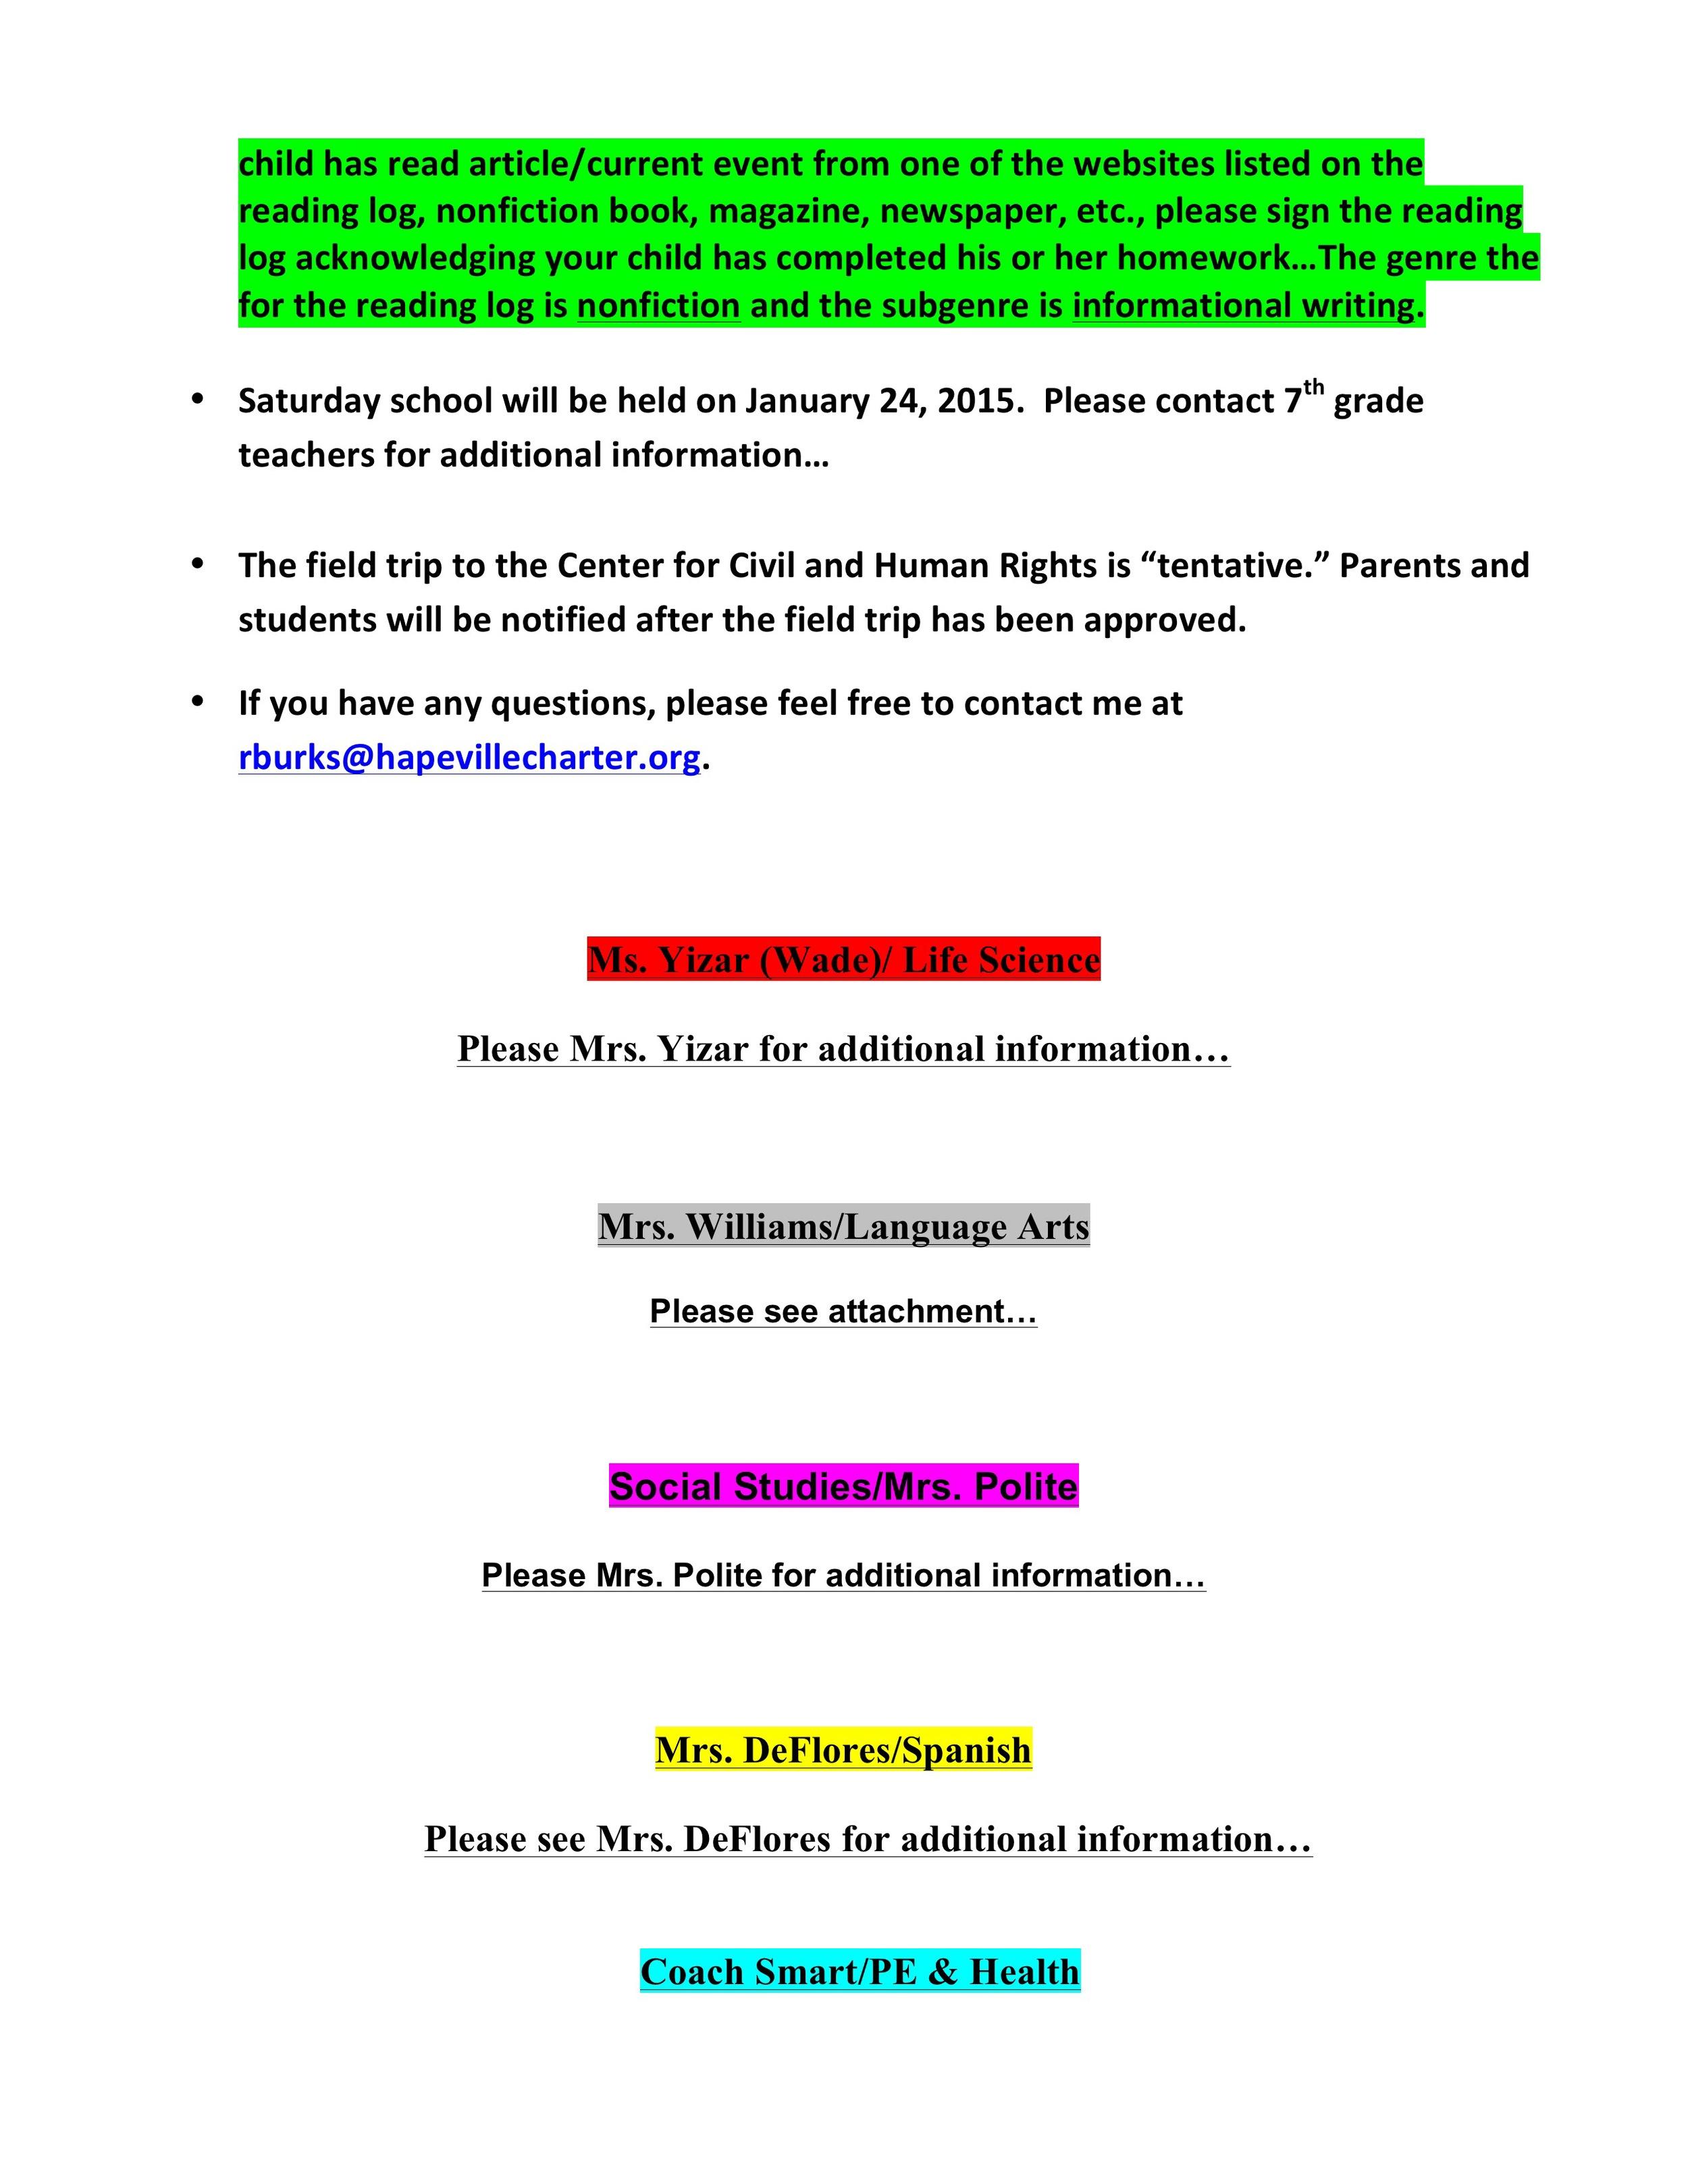 Newsletter Image7th grade jan 20-23 3.jpeg